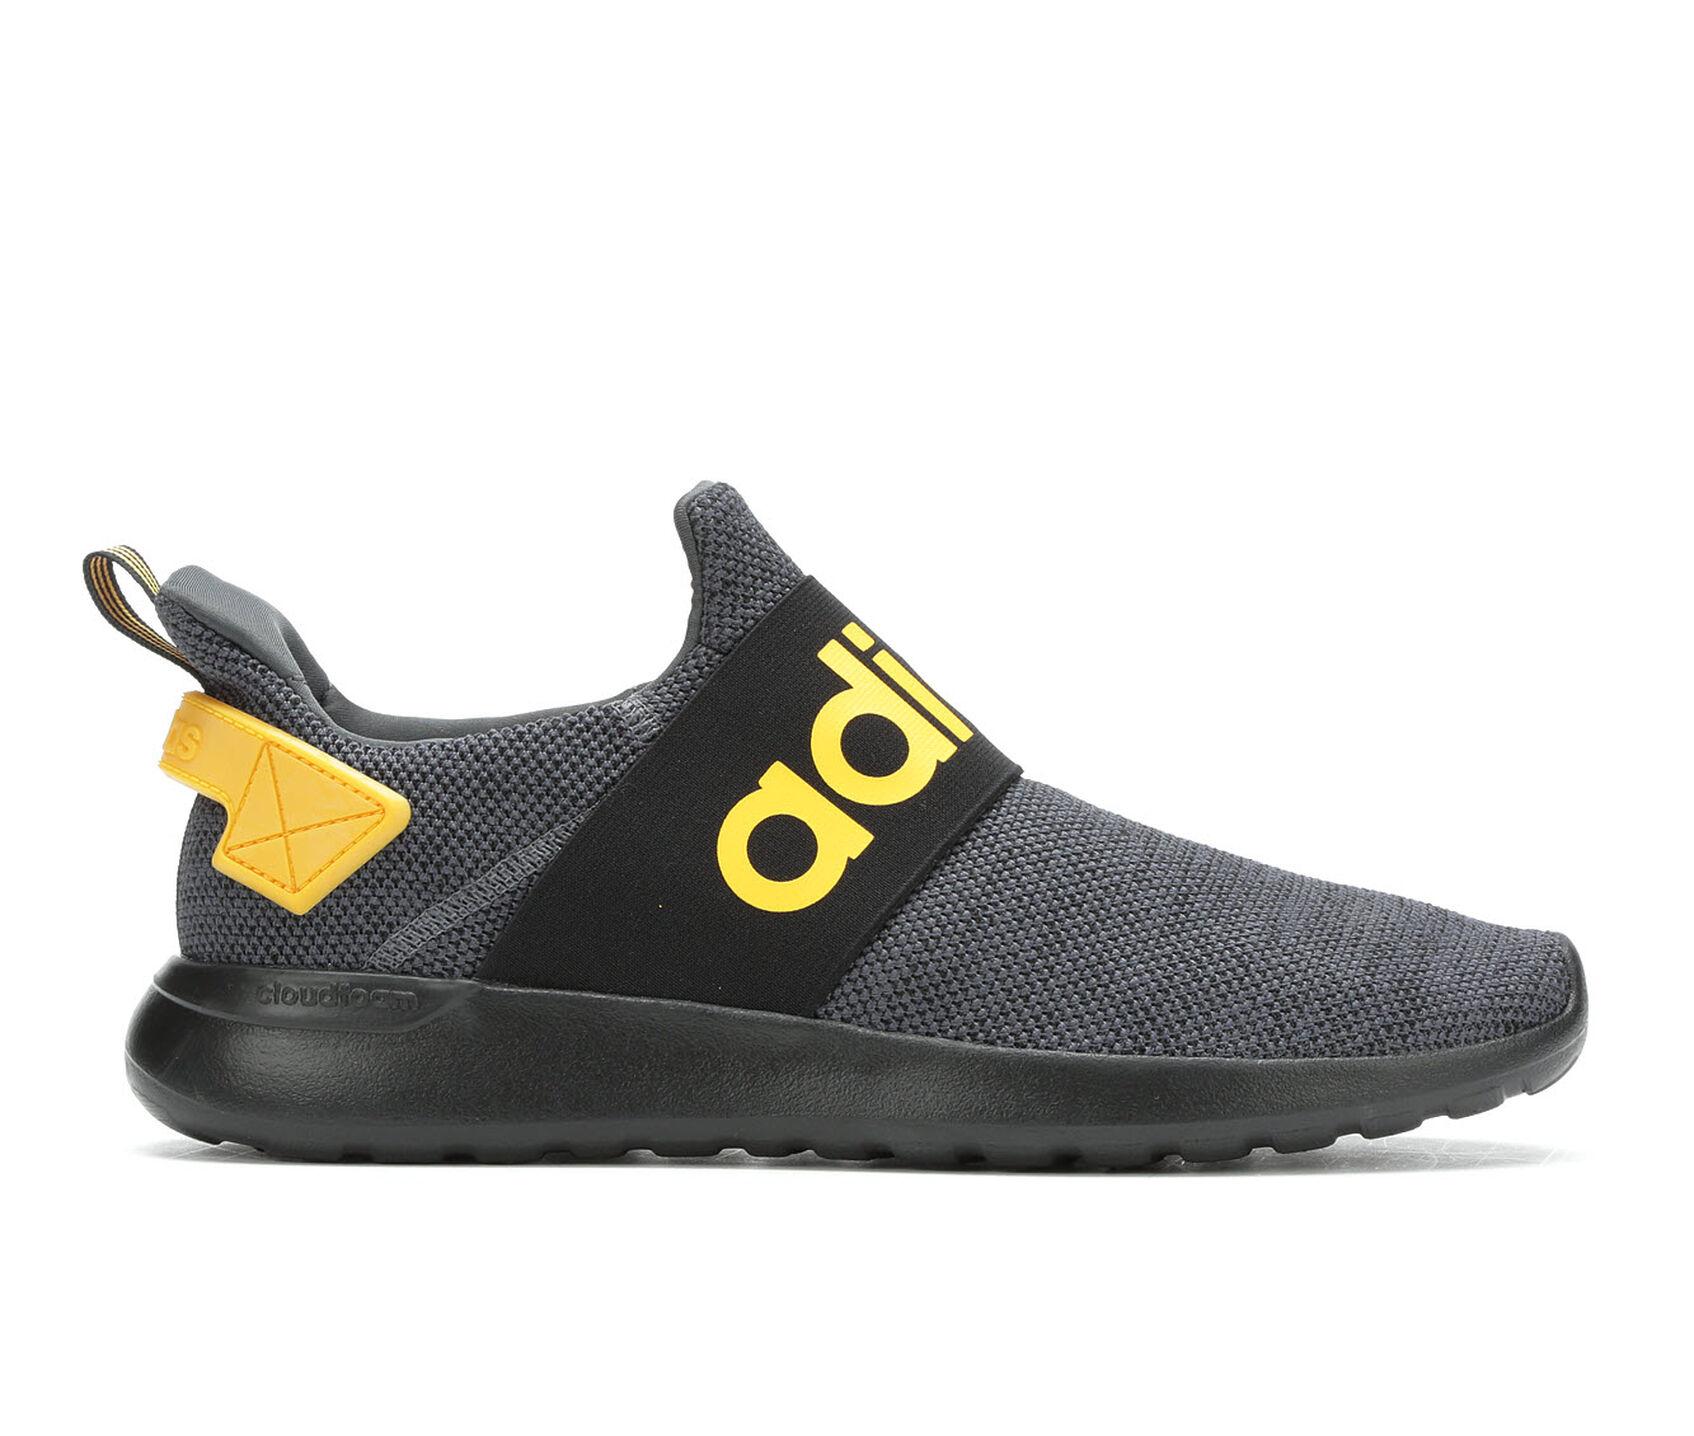 size 40 0ad73 9d4dd Men's Adidas Cloudfoam Lite Racer Adapt Sneakers